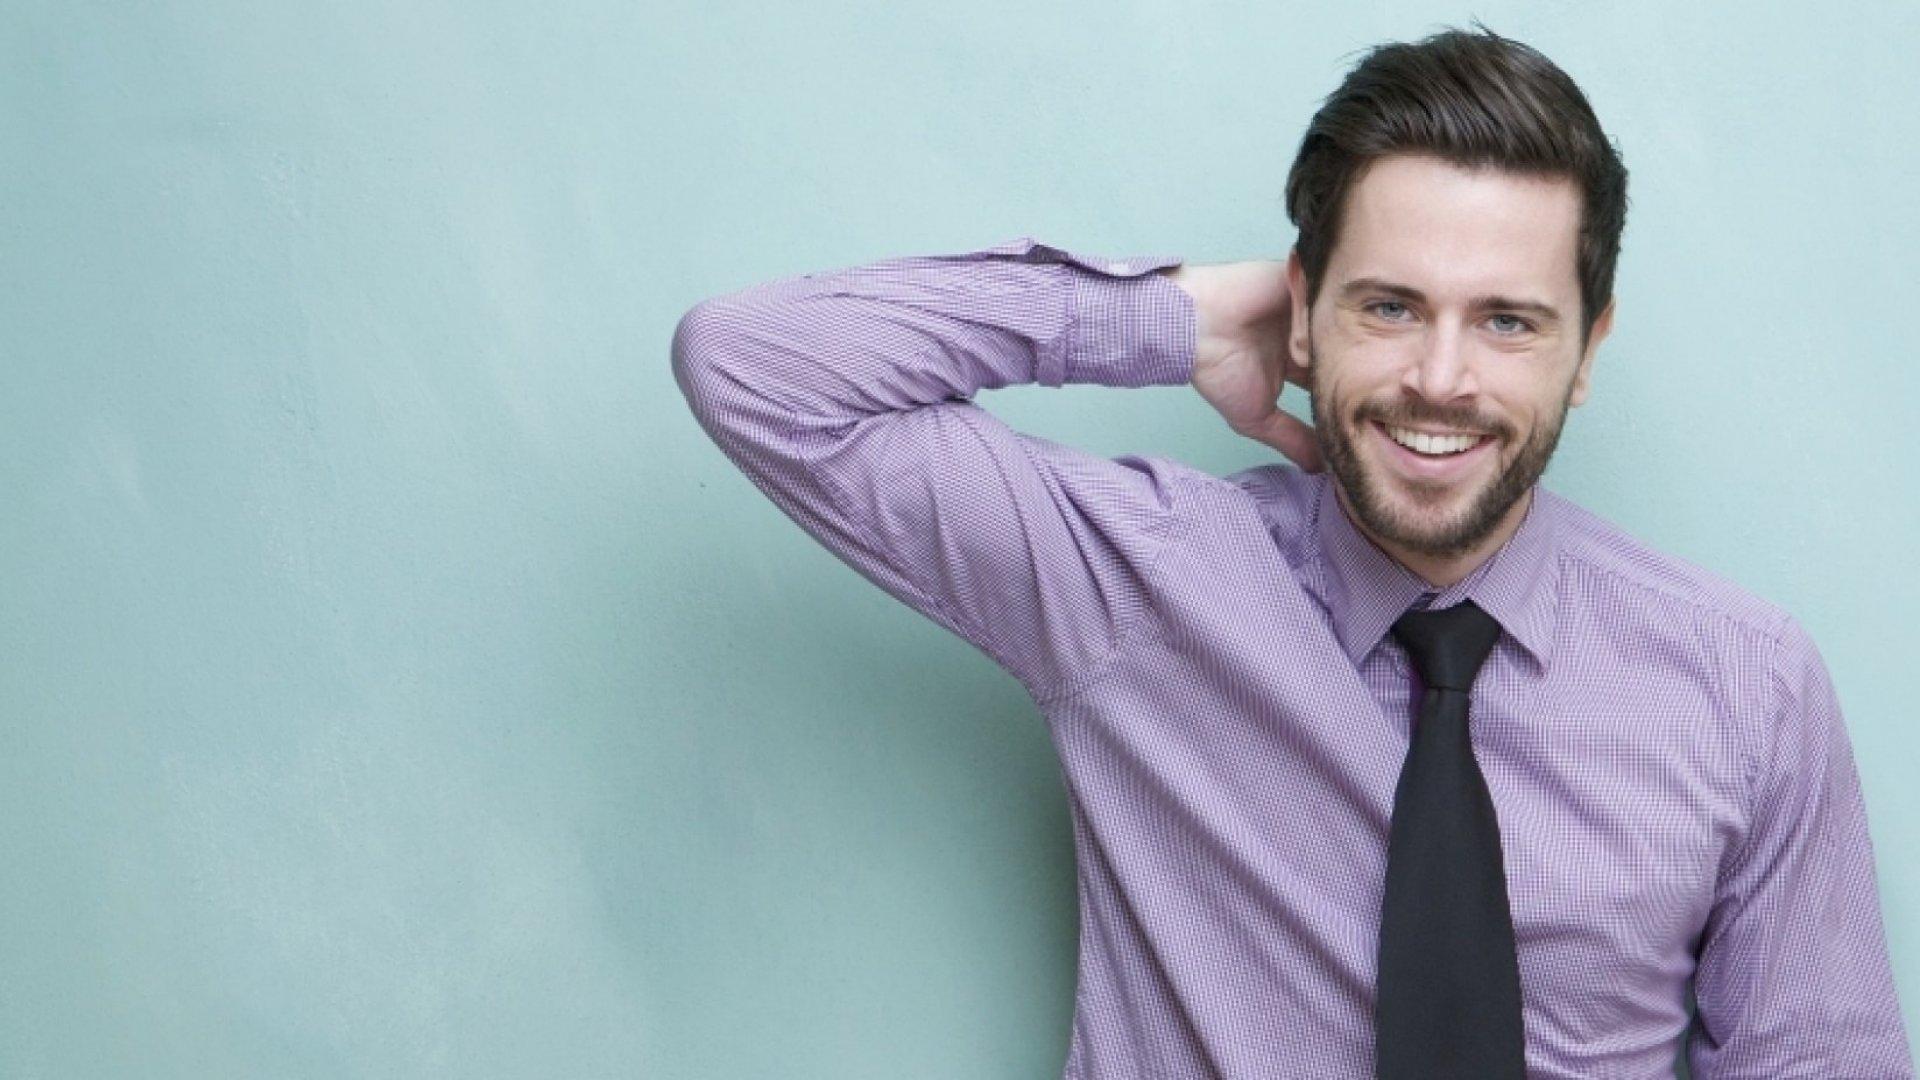 6 Ways to Build More Confidence as a New Entrepreneur